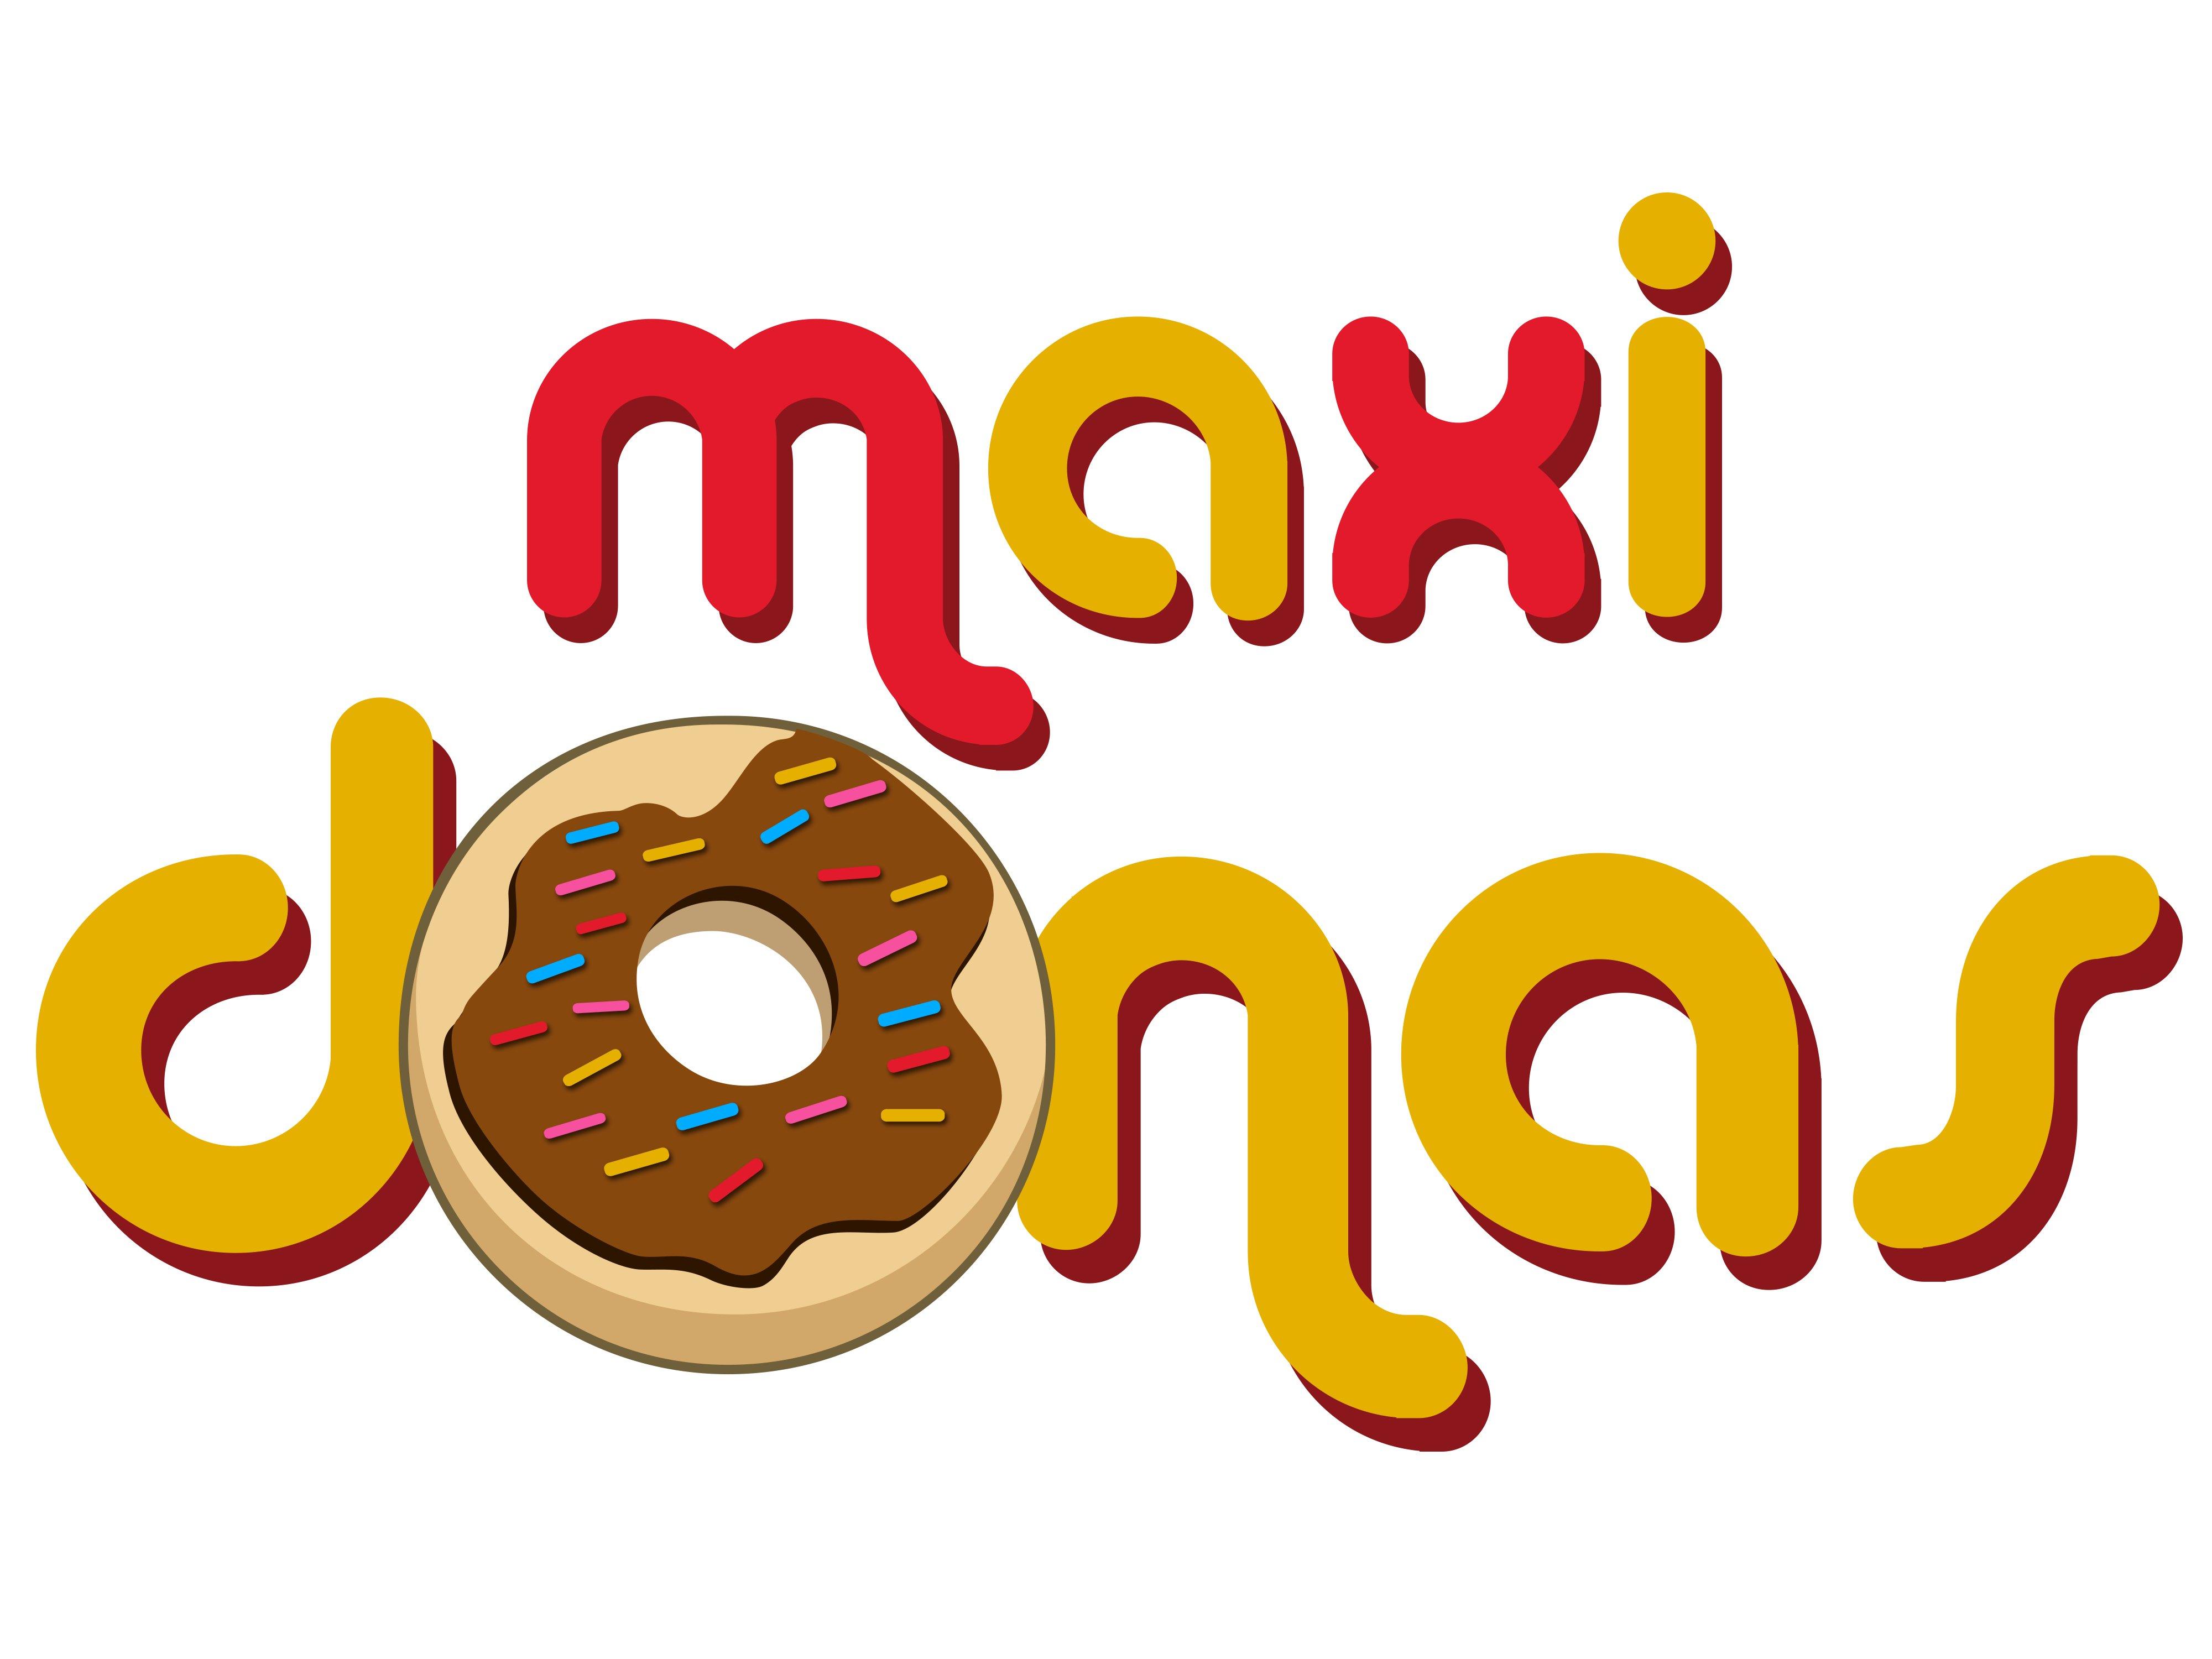 Maxi Donas